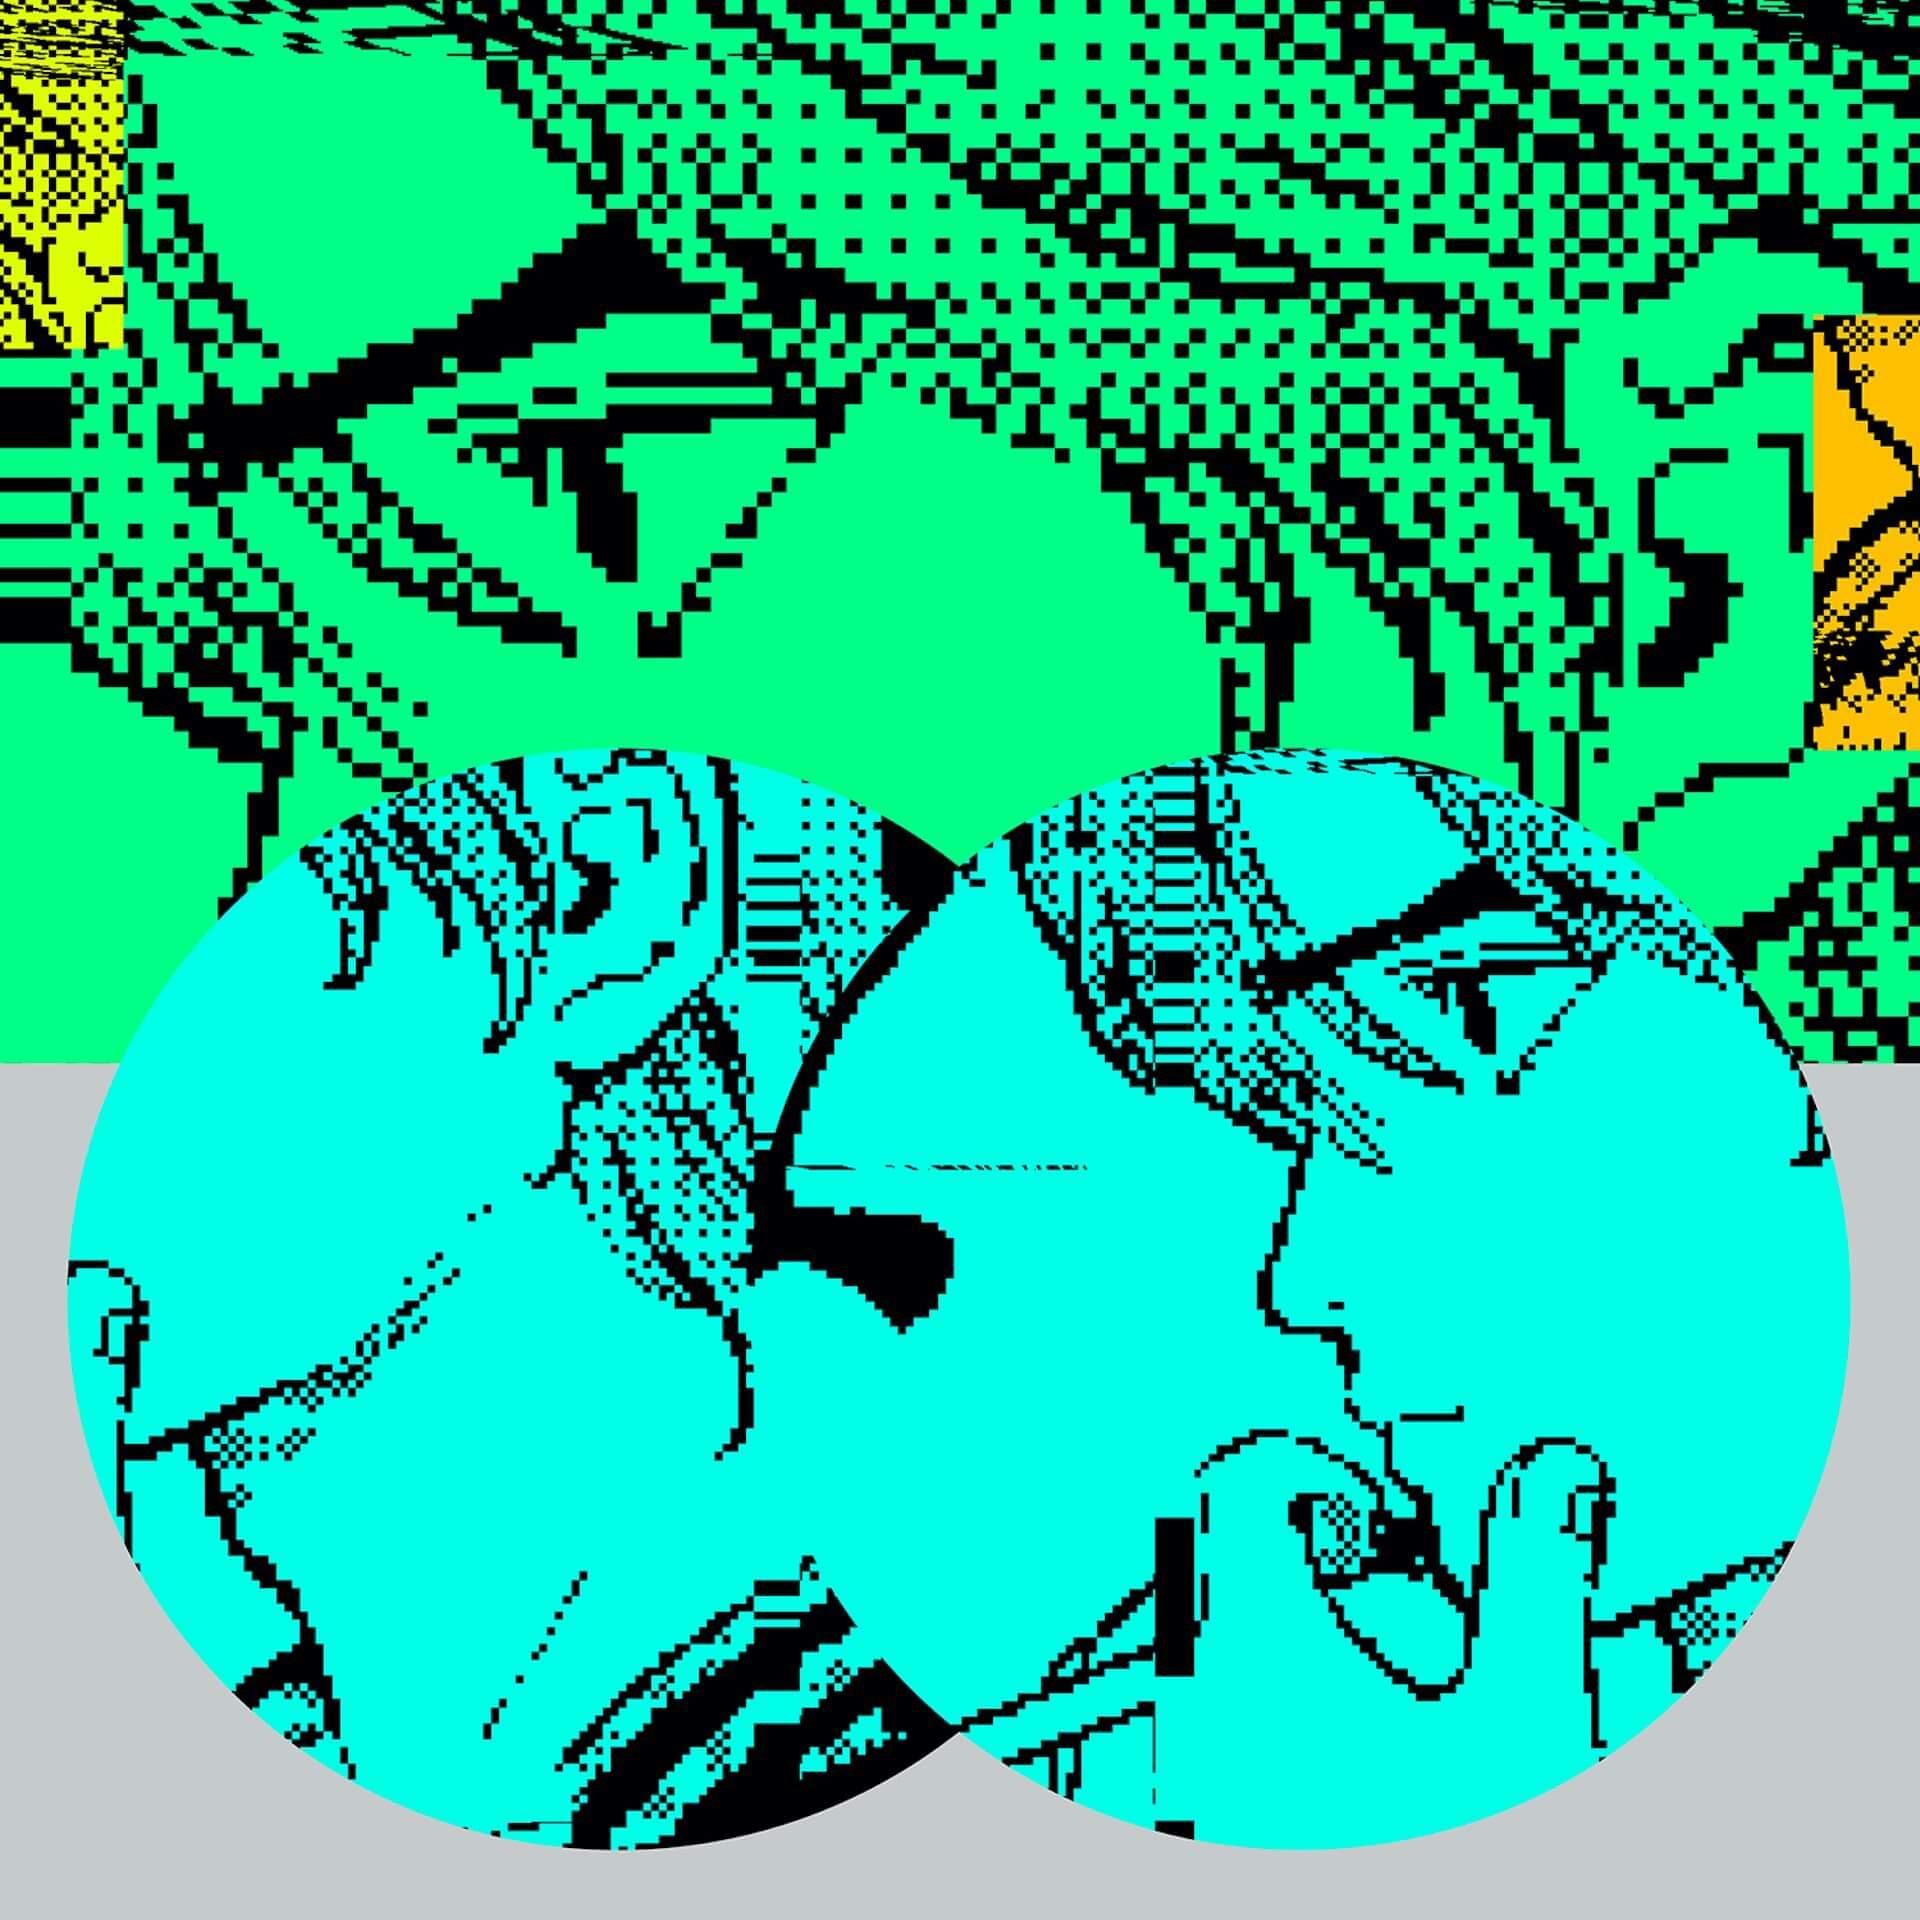 tofubeatsがアルバム『RUN』のREMIXESをリリース決定!表題曲にはKREVA、VaVaが参加 music200821_tofubeats_remixes_04-1